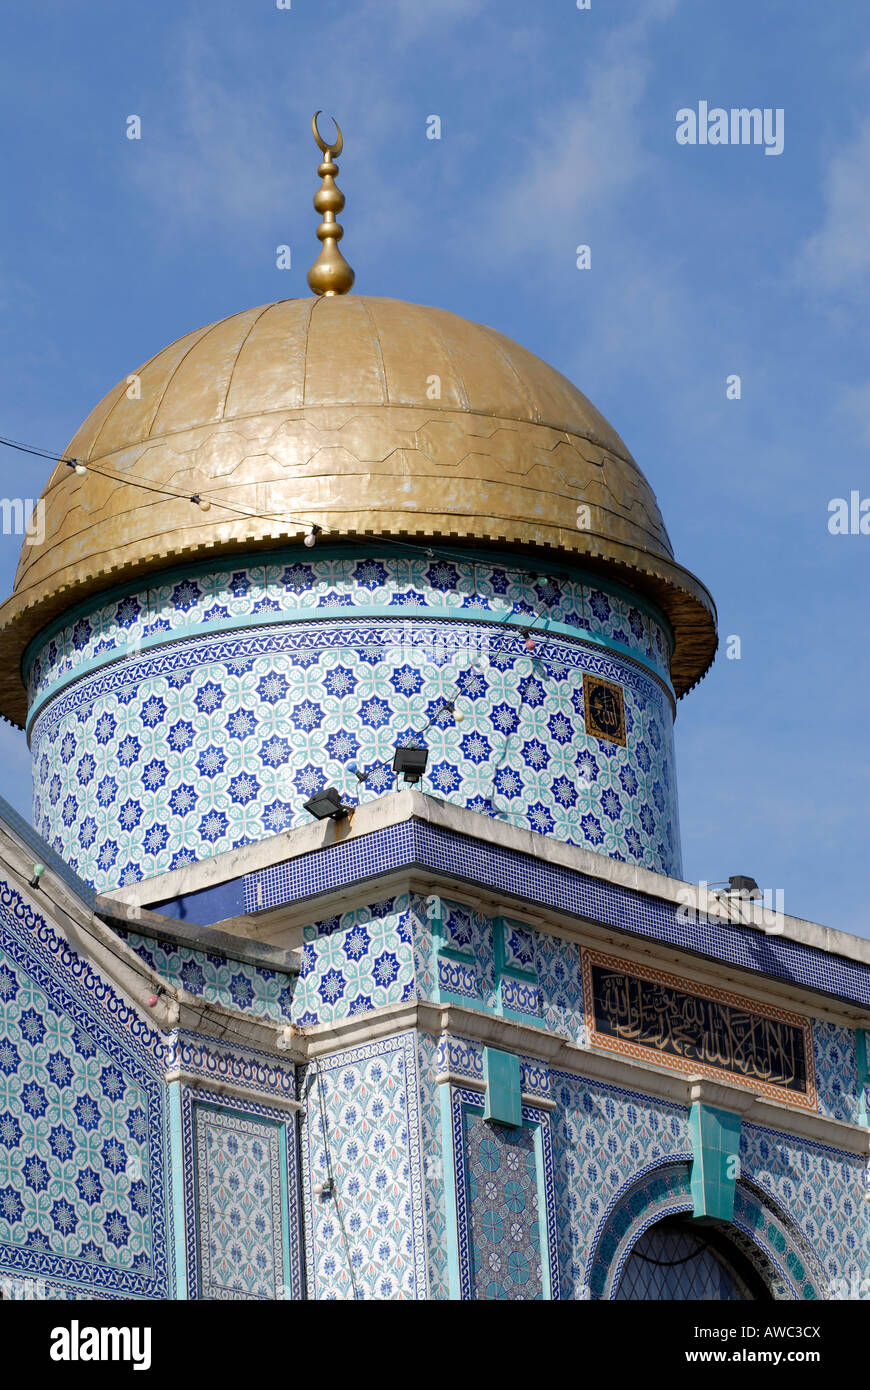 UK Aspect of the Aziziye mosque in Stoke Newington east London - Stock Image